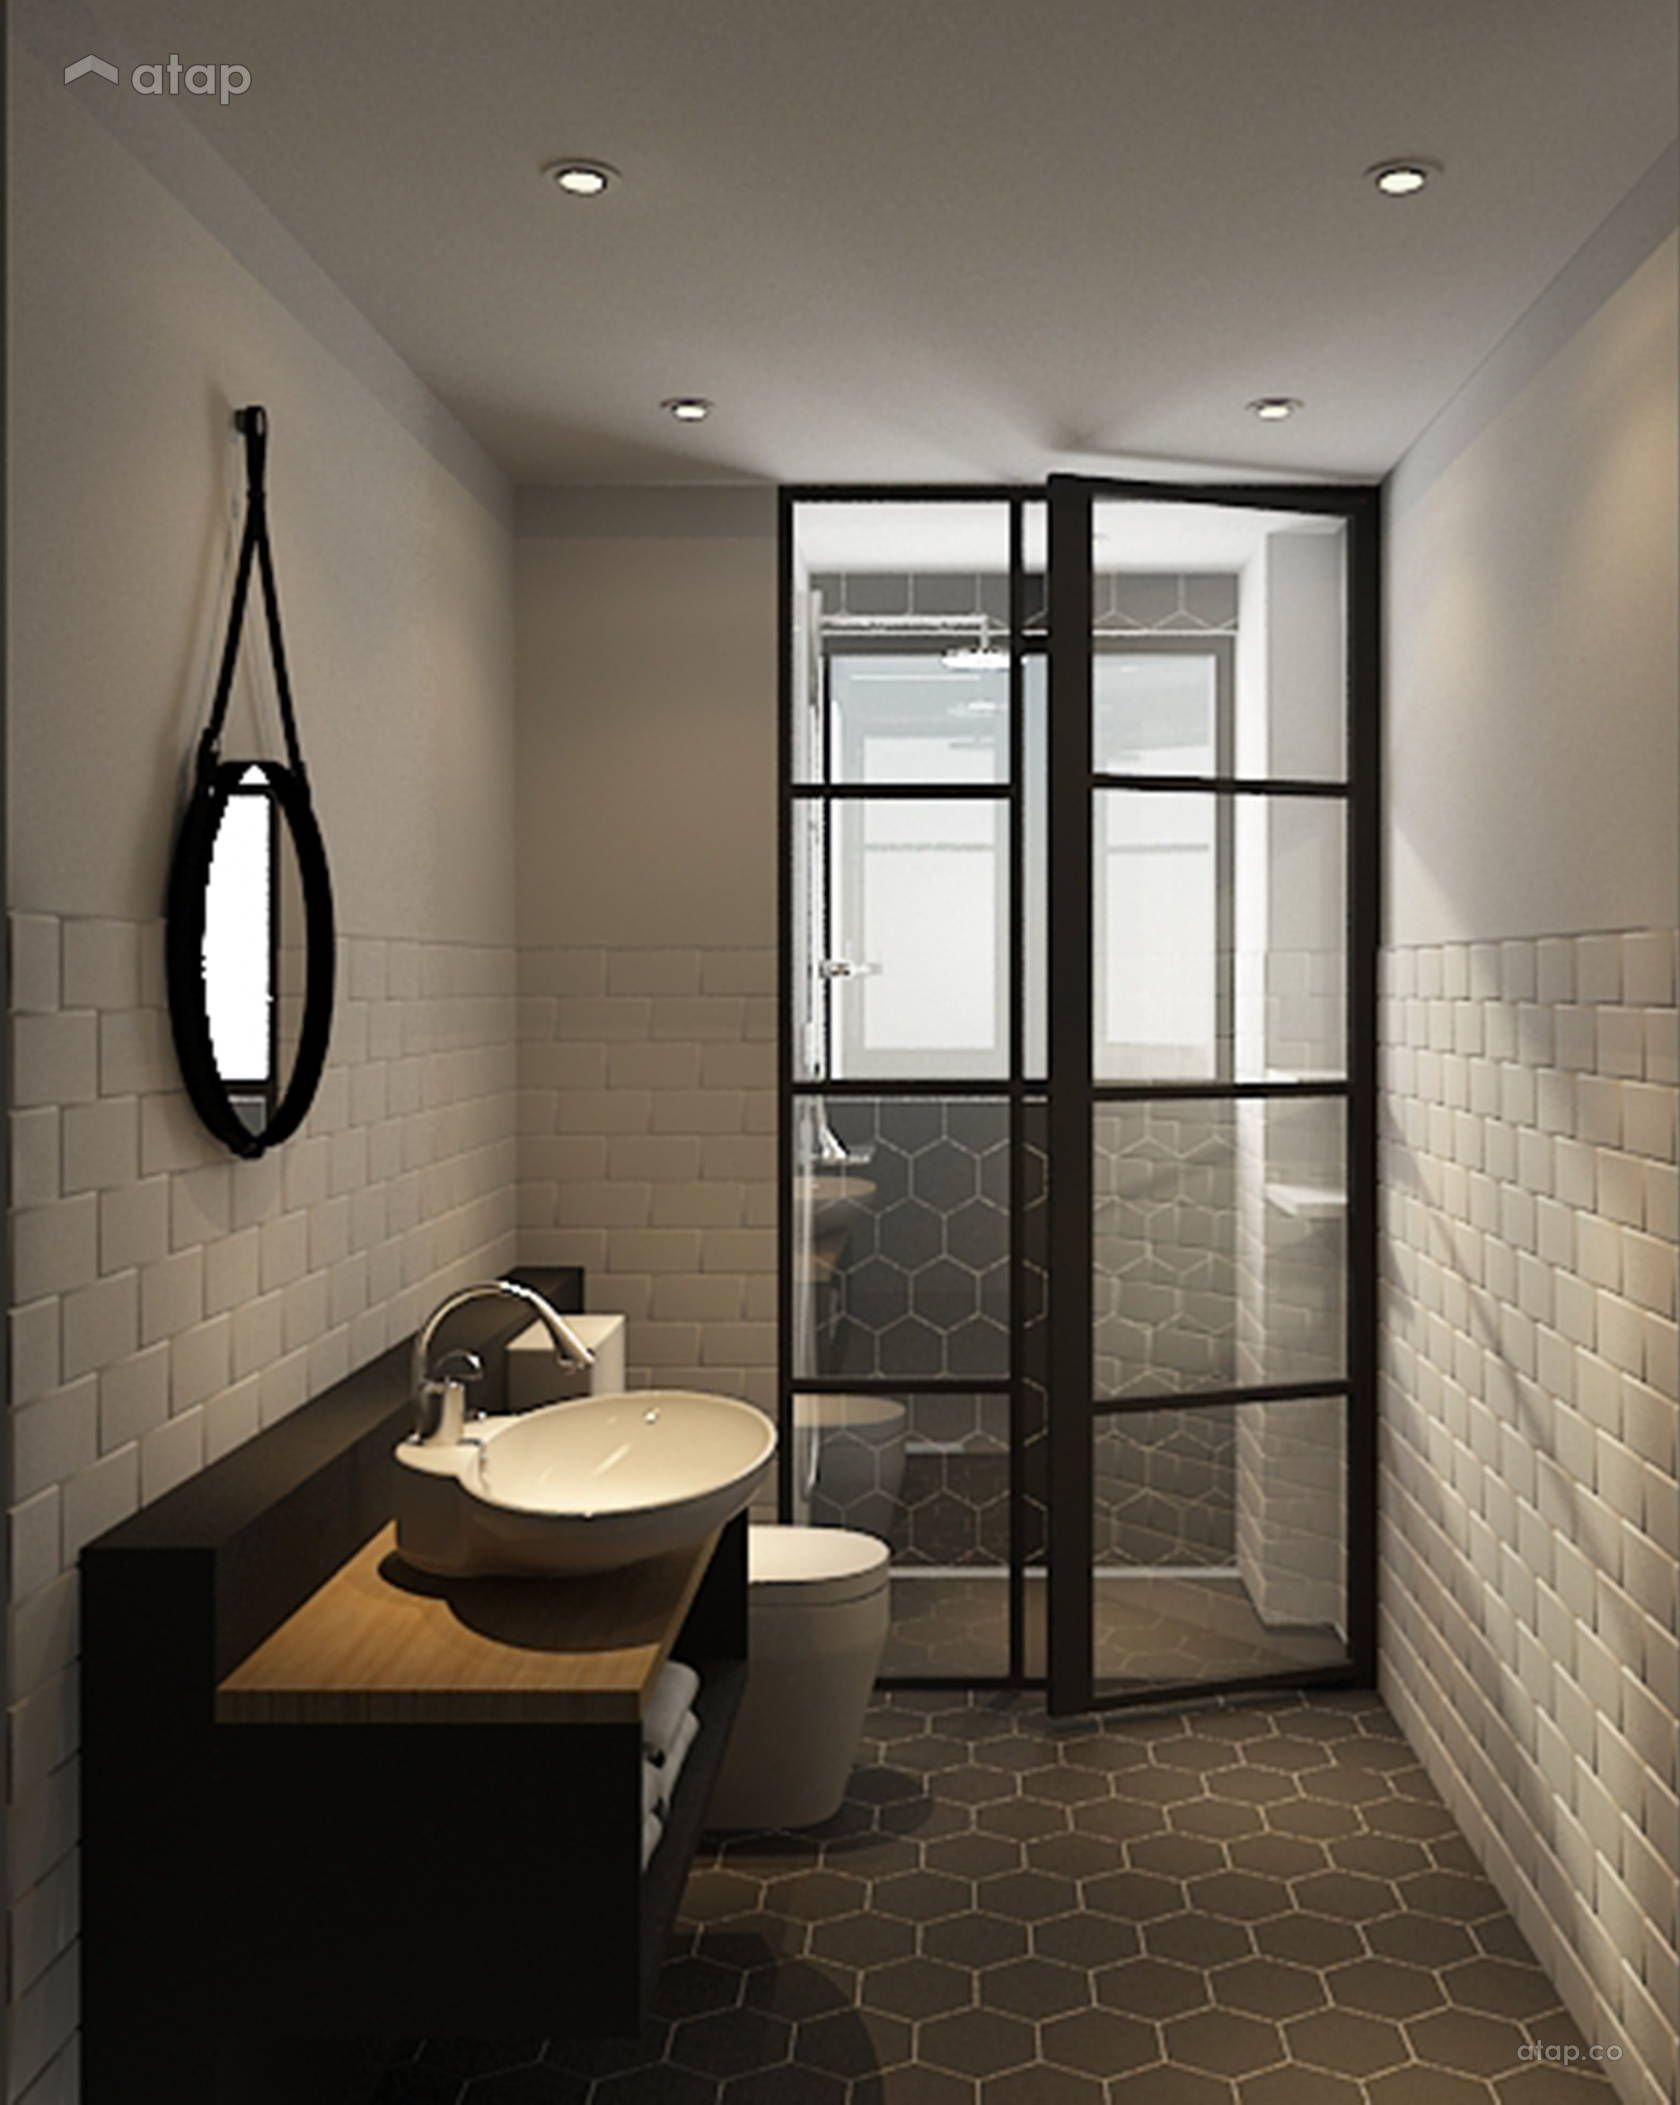 Minimalistic Bathroom Condominium Design Ideas Photos Malaysia Atap Co Bathroom Renovations Condominium Design Bathroom Renovation